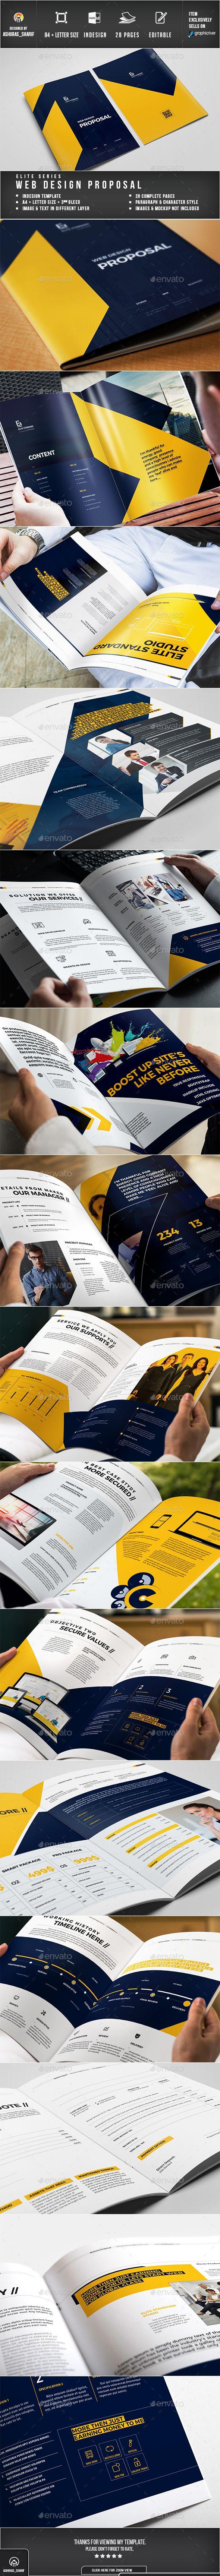 Browse premium design templates and stock graphics